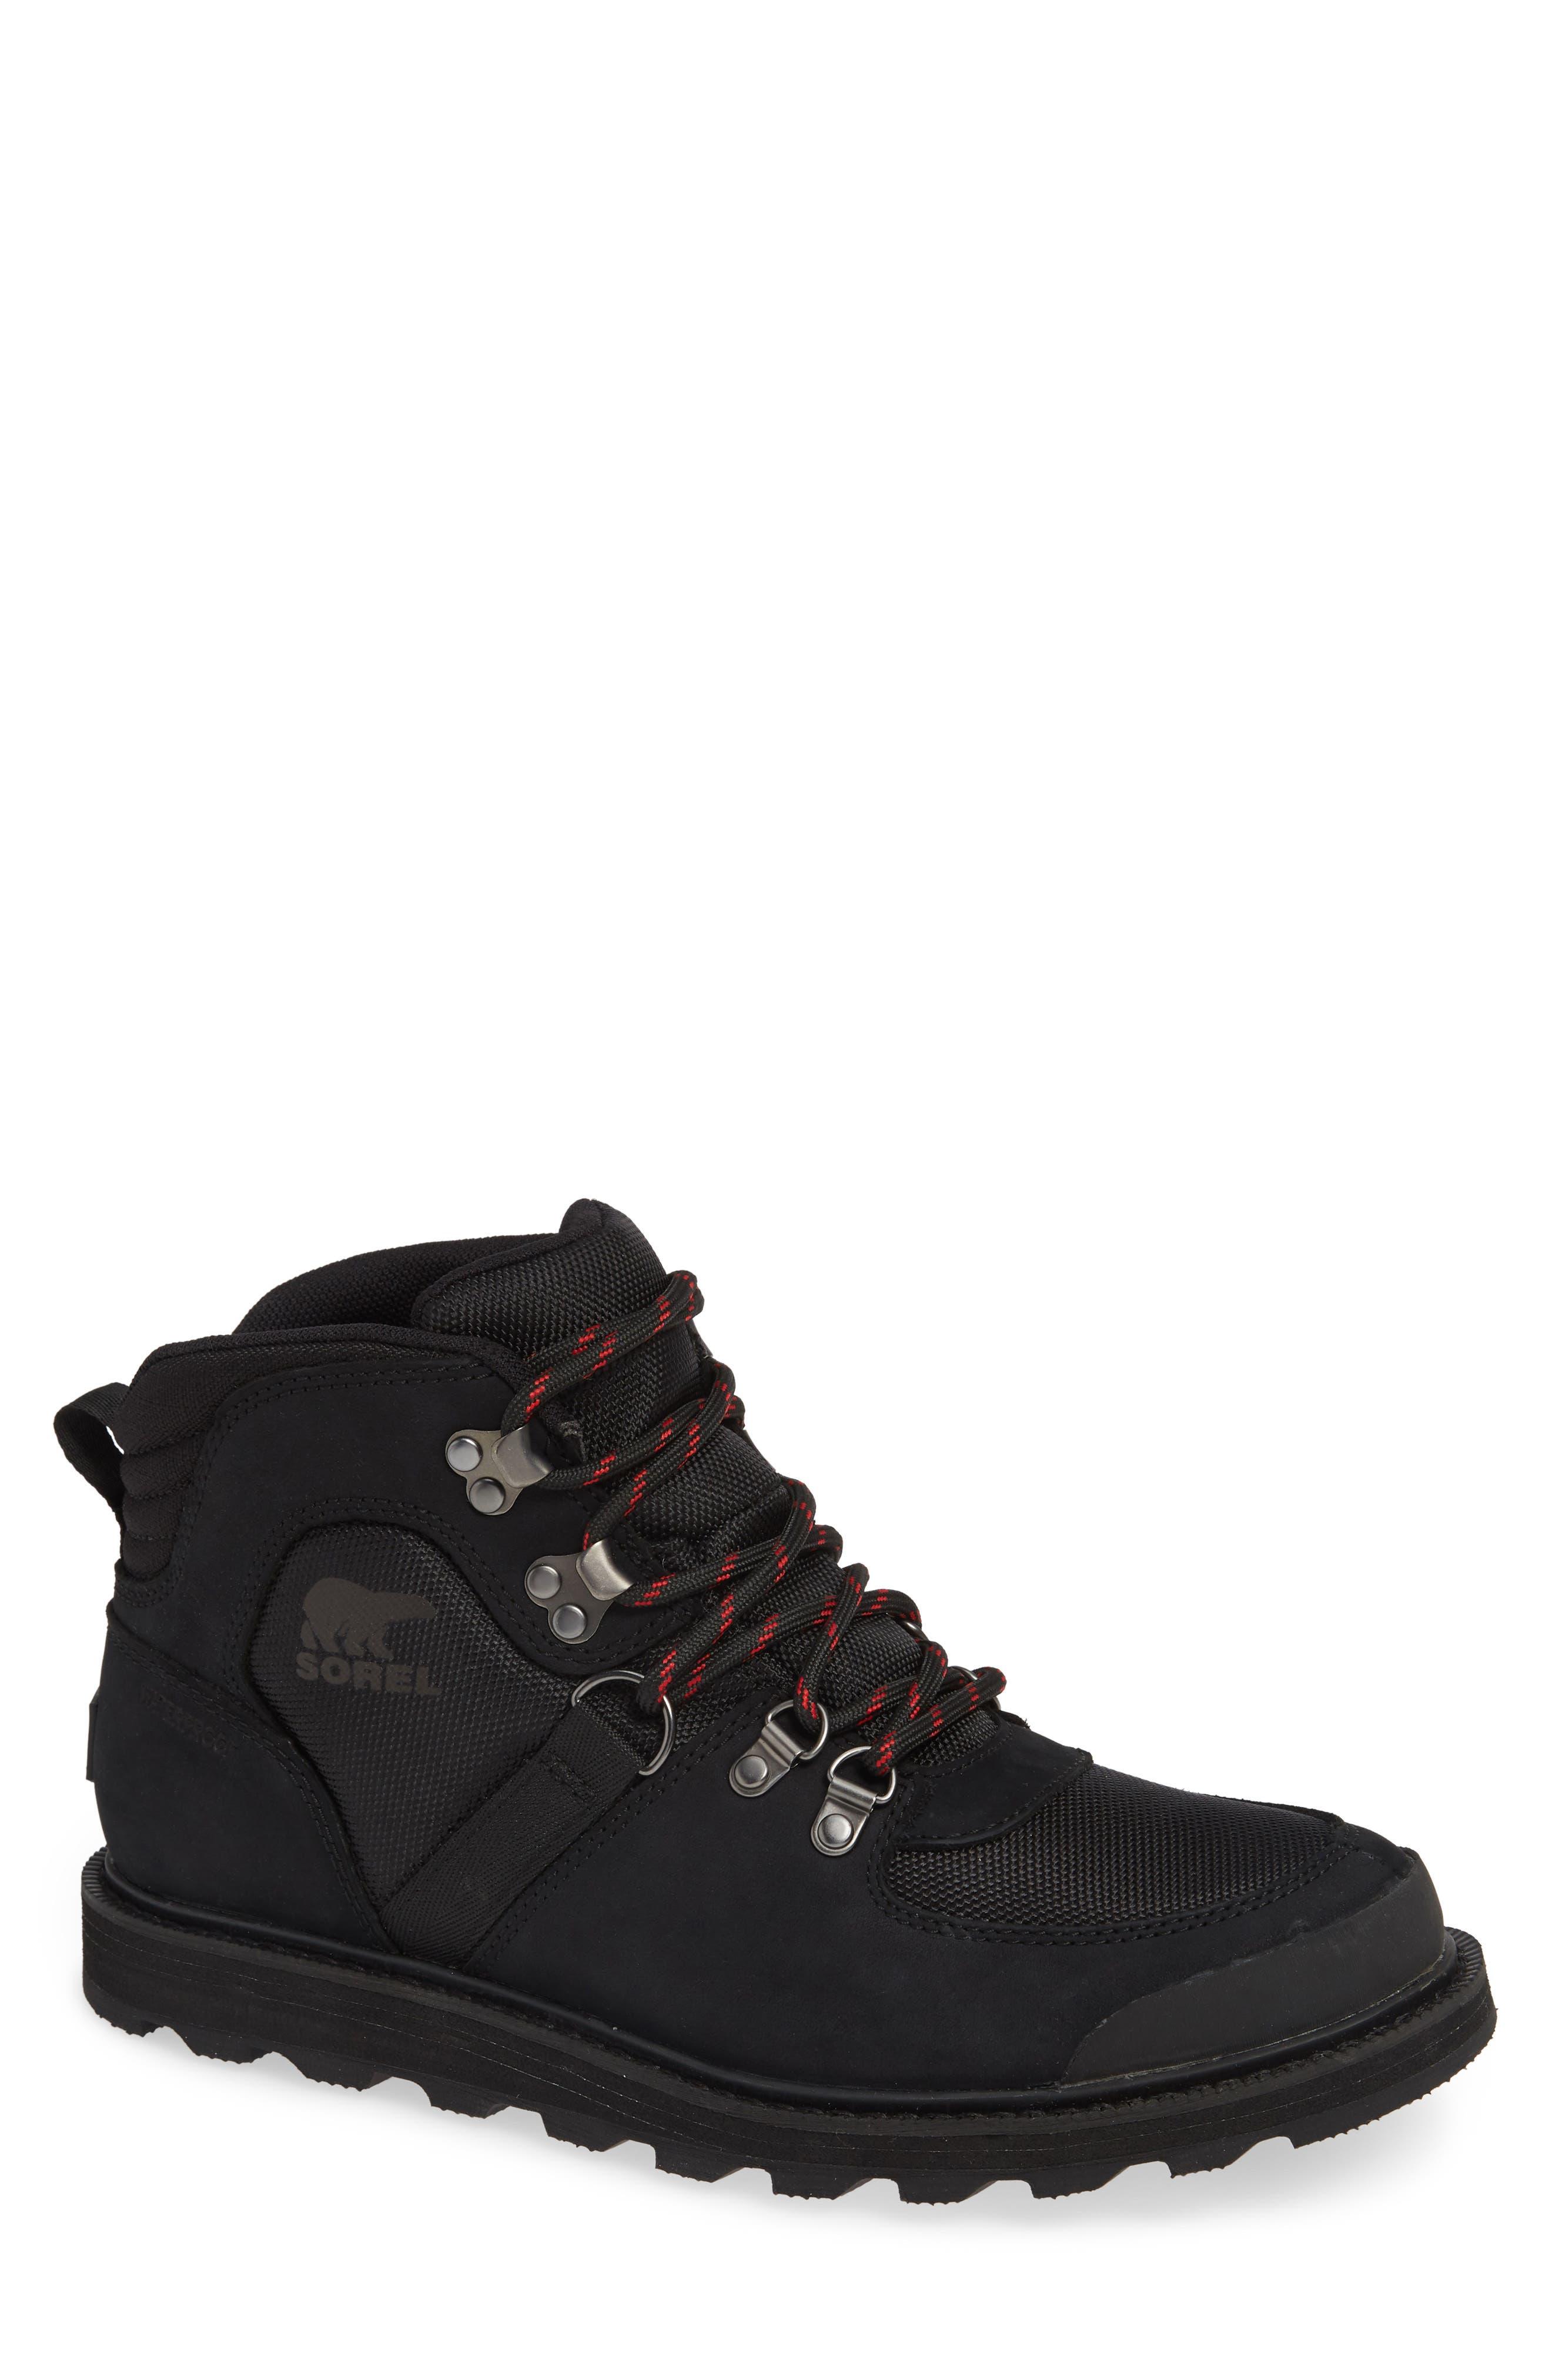 Sorel Madson Sport Waterproof Hiking Boot- Black